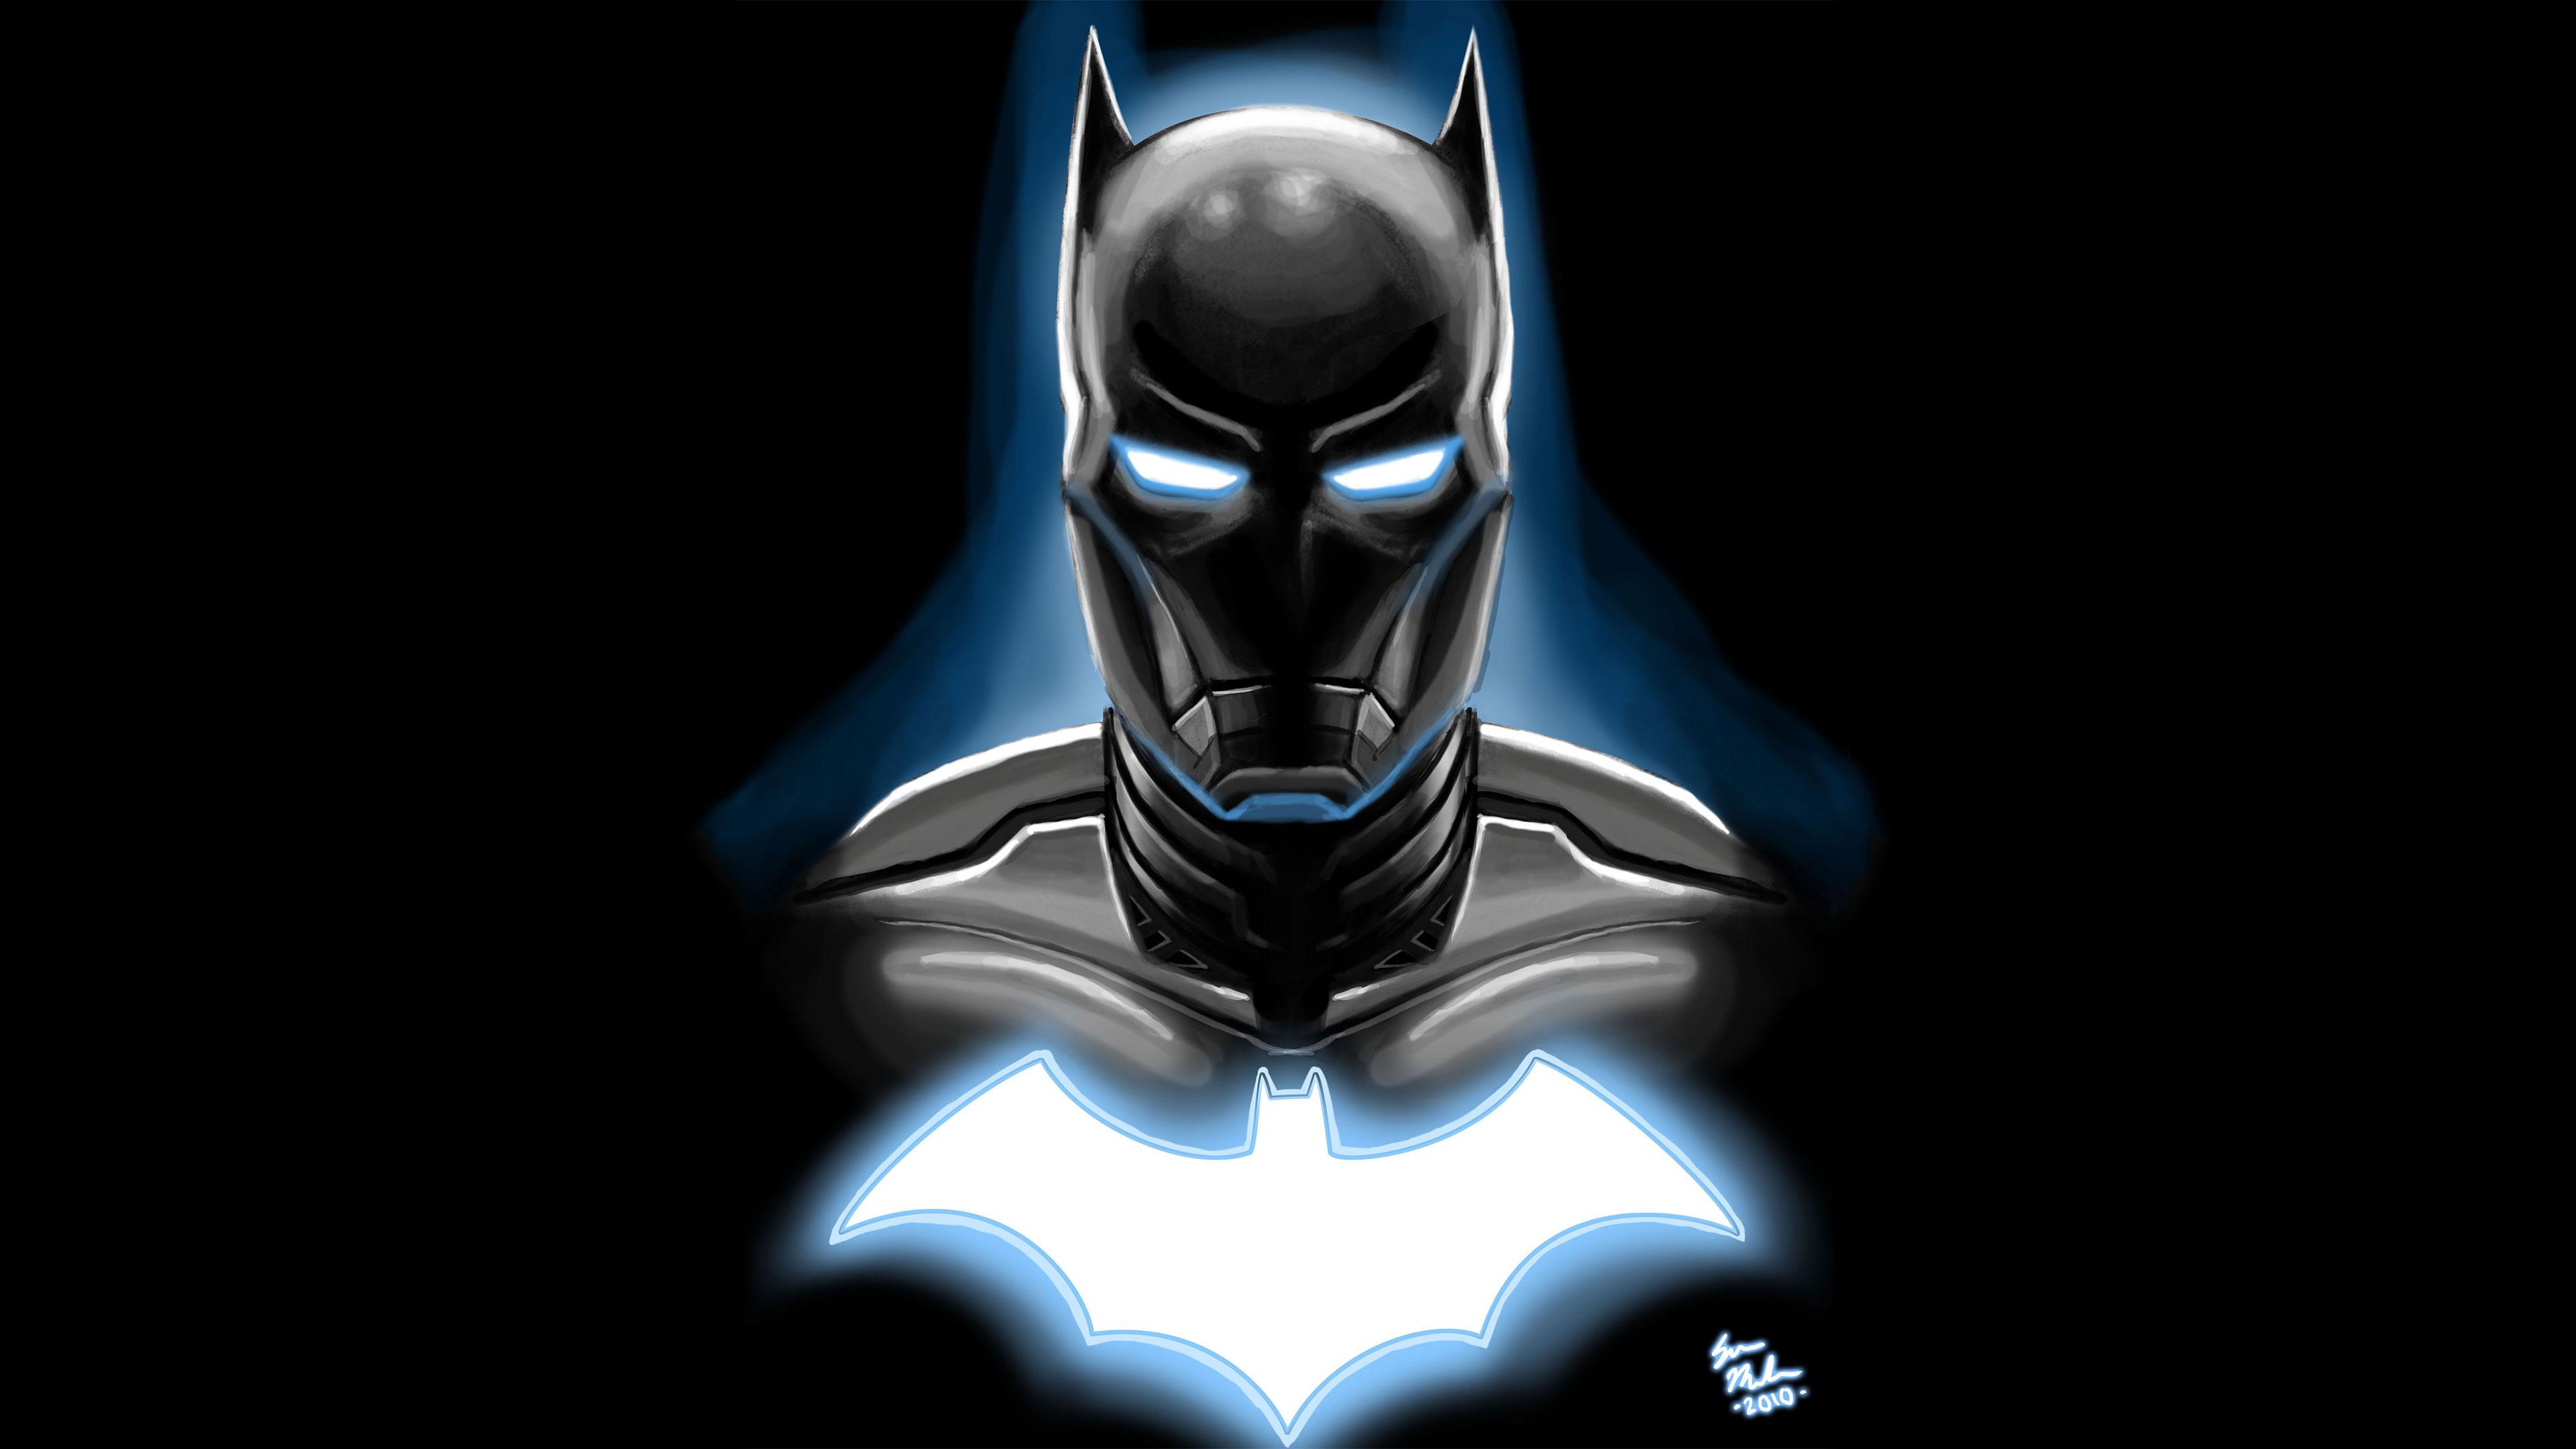 Iron Batman Artwork 4k, HD Superheroes, 4k Wallpapers ...